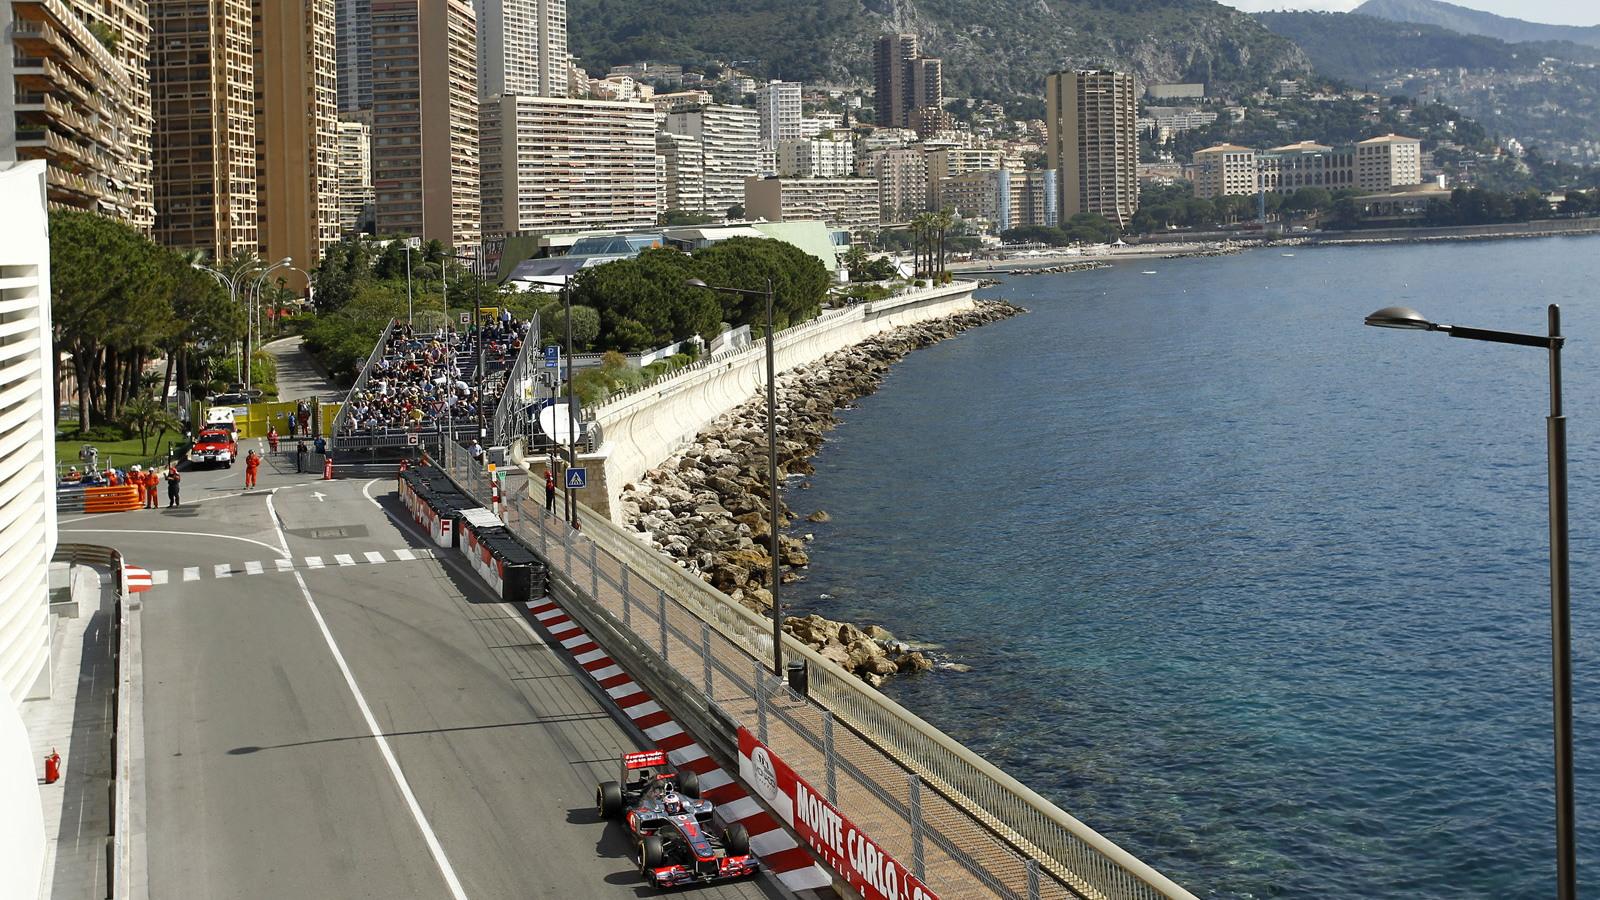 McLaren at the 2012 Formula 1 Monaco Grand Prix